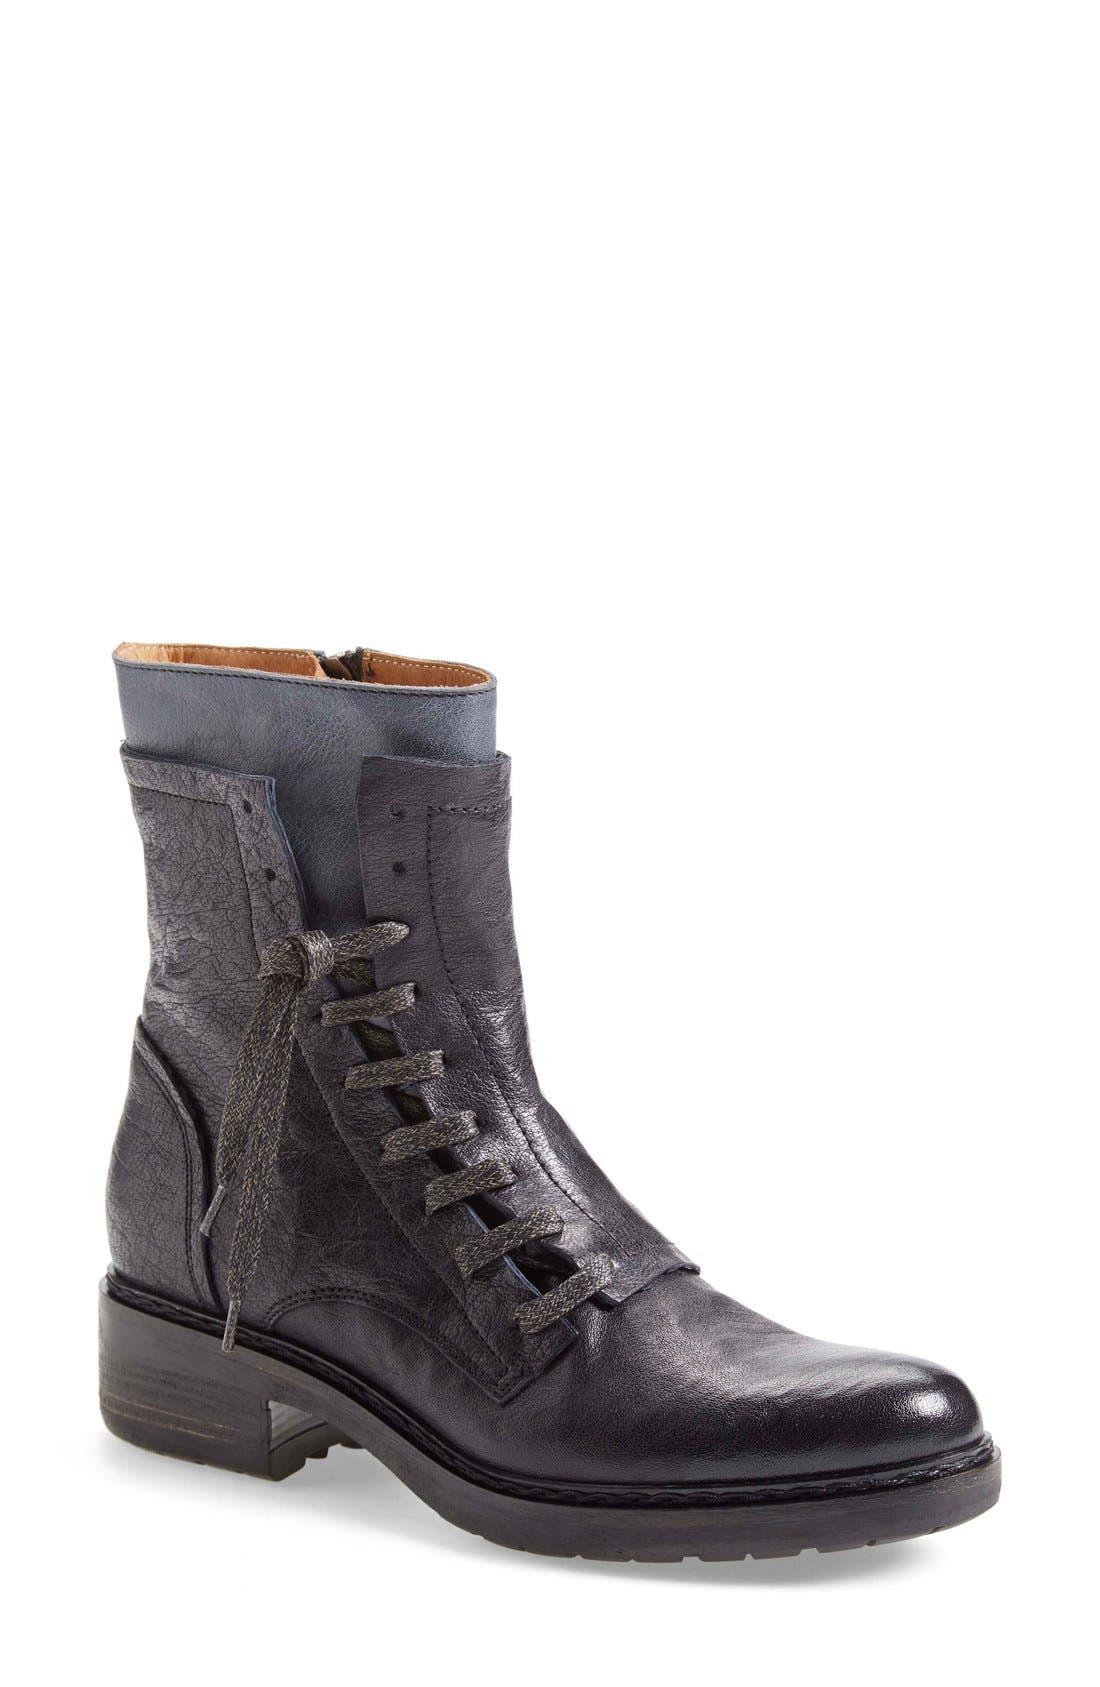 Alternate Image 1 Selected - Alberto Fermani 'Freya' Lace-Up Combat Boot (Women)